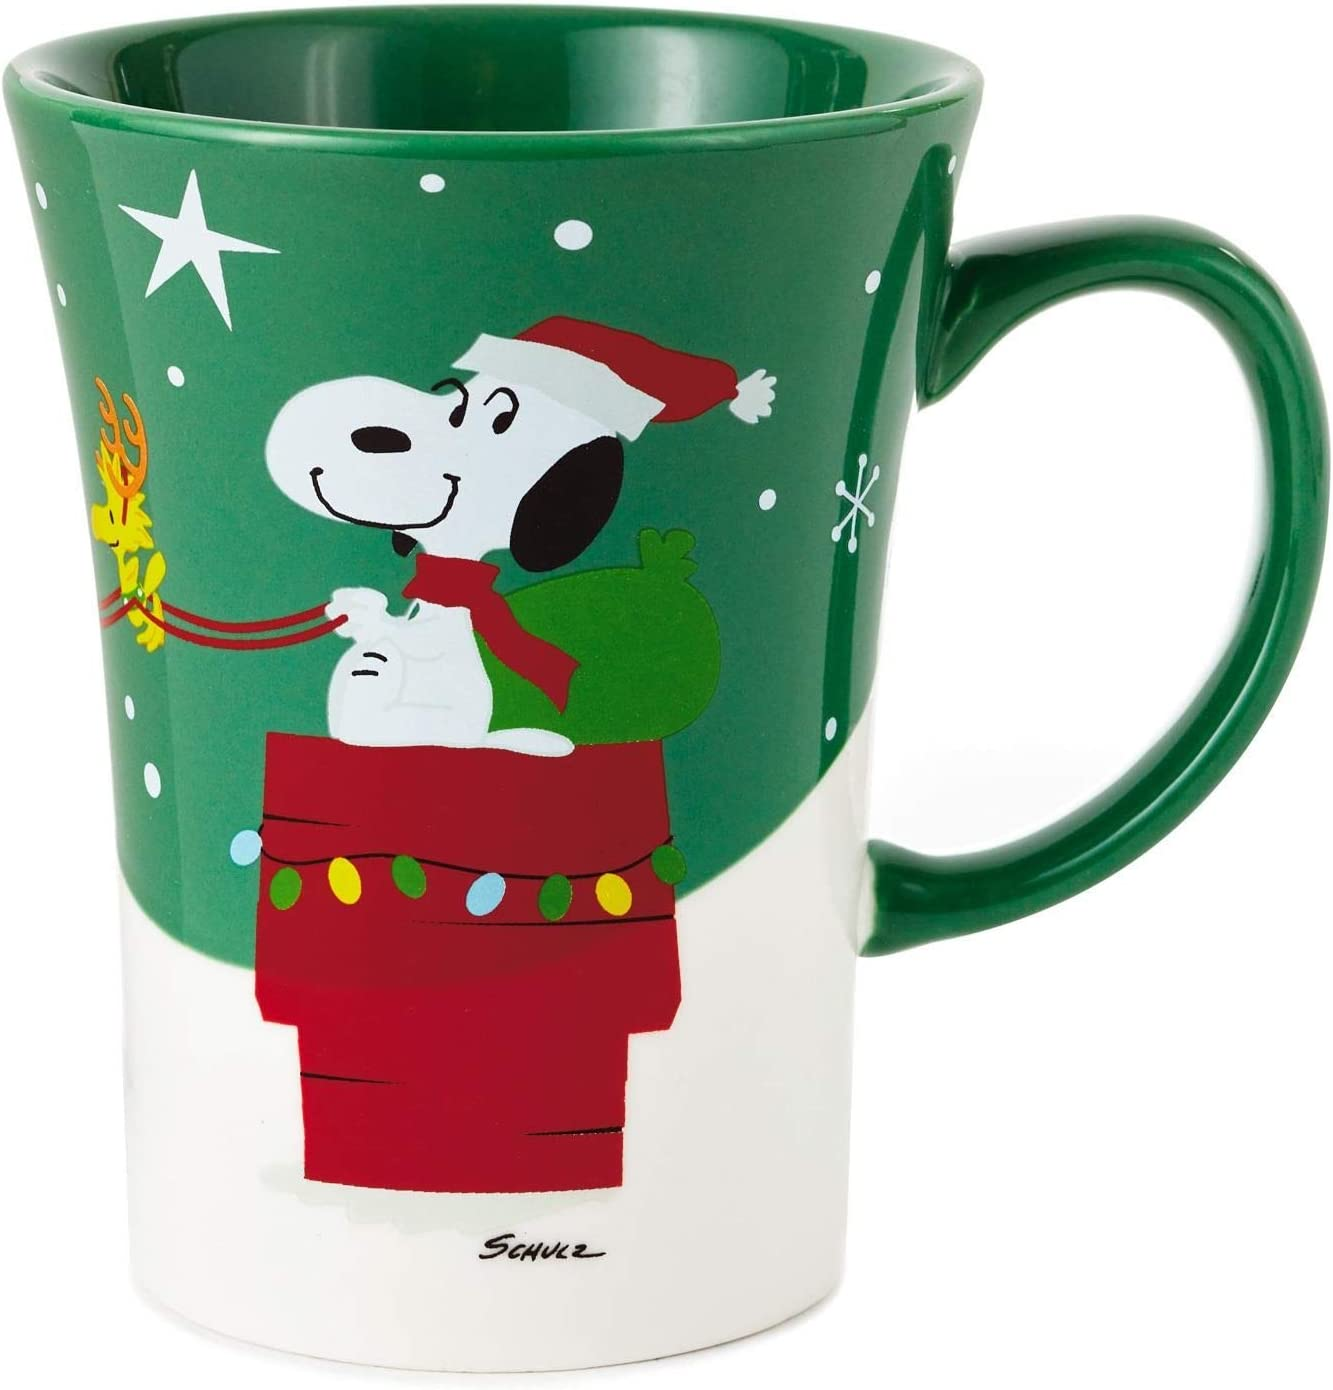 Snoopy Christmas Peanuts Coffee Mug Ceramic Cup Green Woodstock New HO WOOF